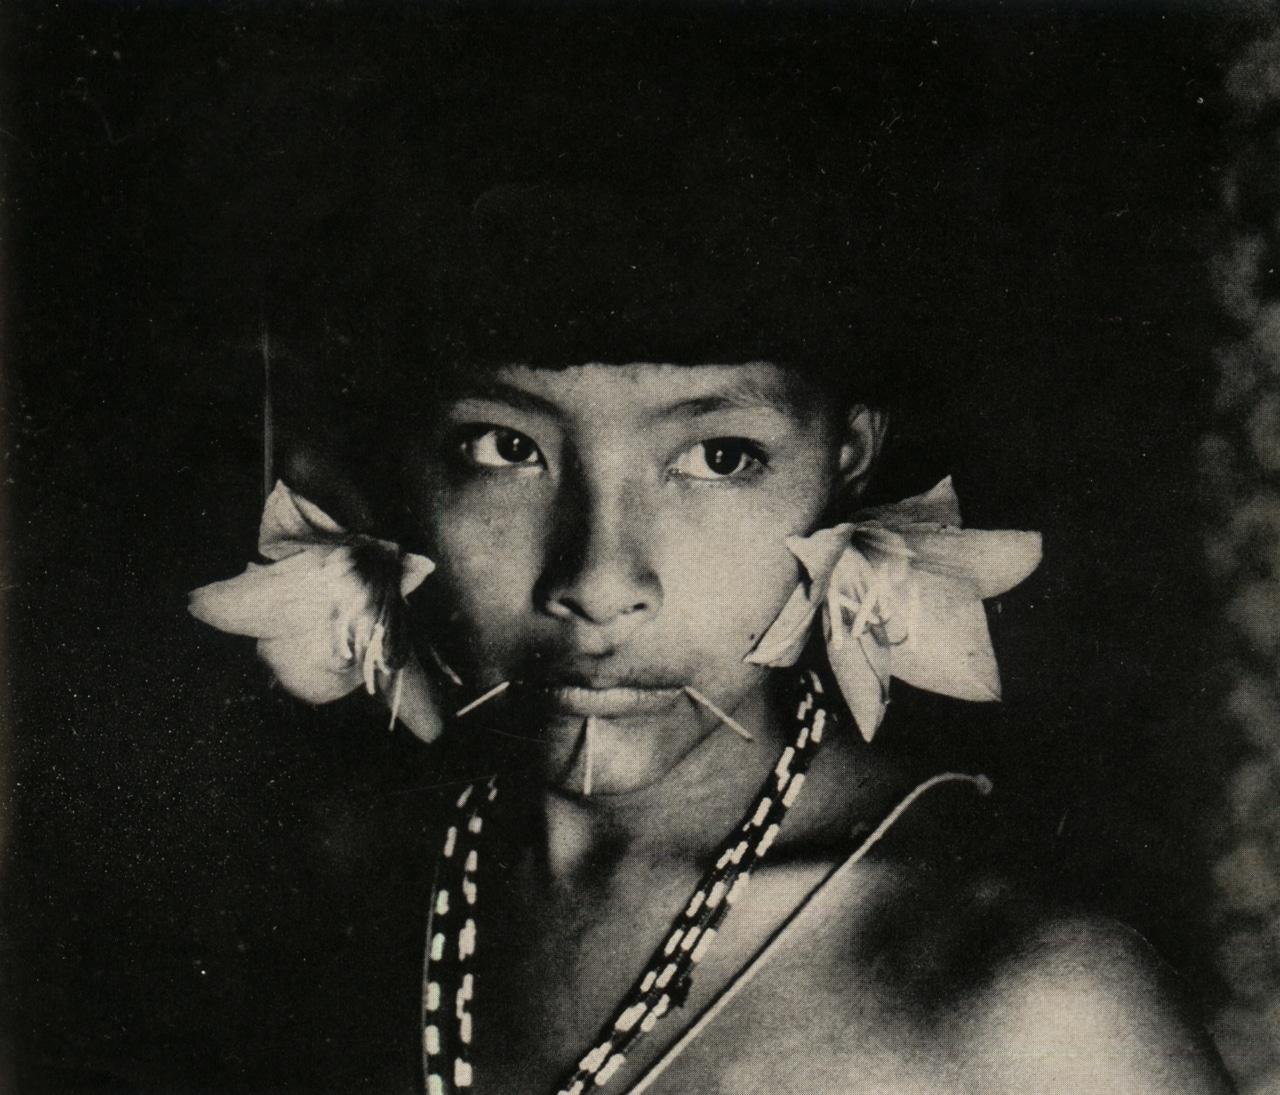 A Sanemá-Yanoama woman with her adornments Daniel de Barandiaran Life and death among the Sanemá-Yanoama Indians Anthrolopolgica, number 21, December 1967